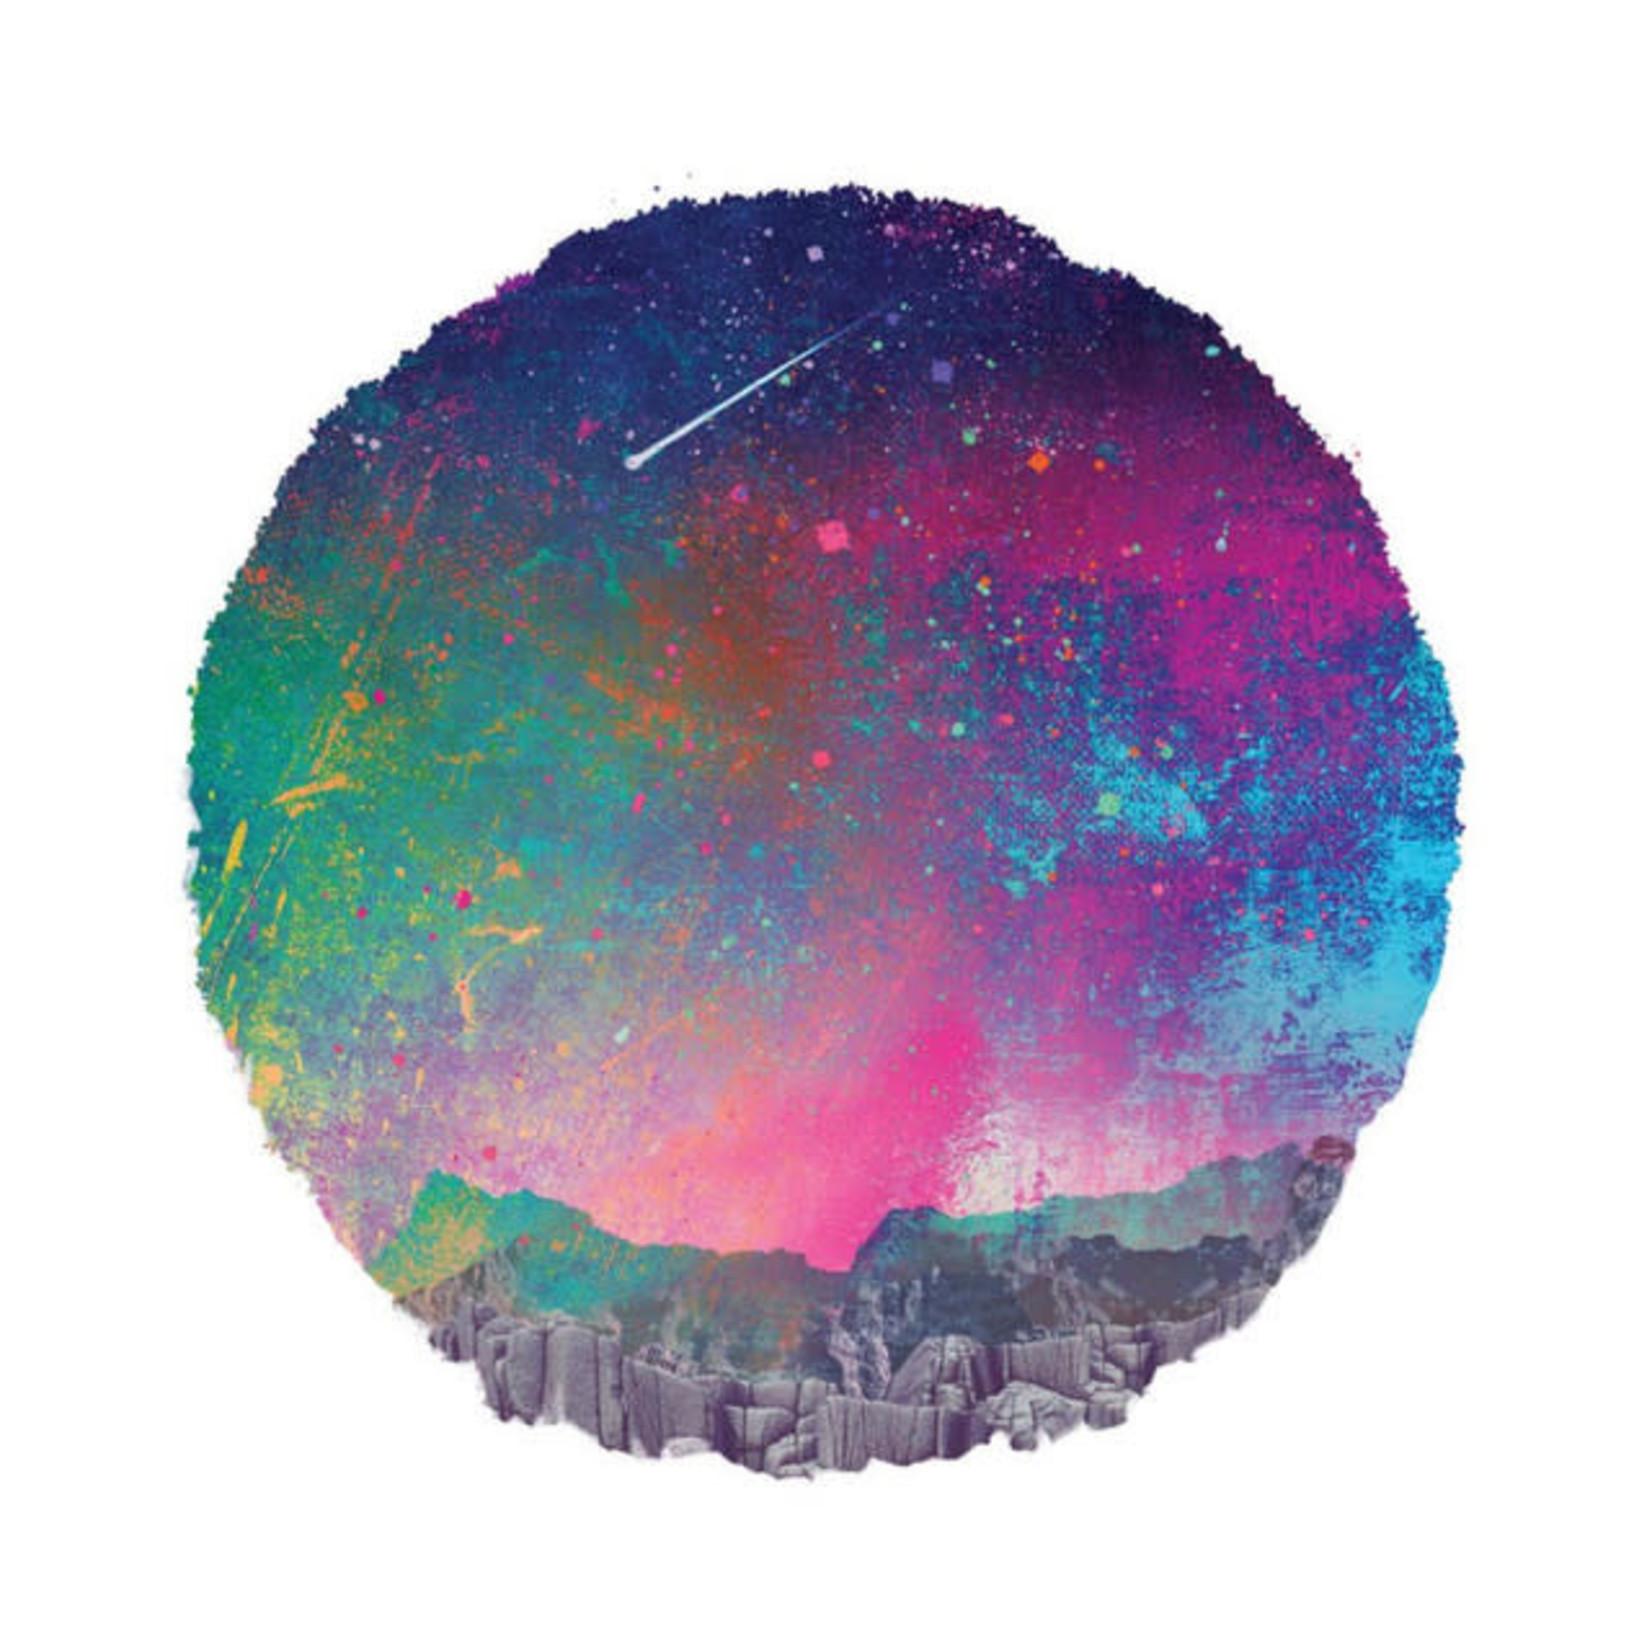 Vinyl Khruangbin - The Universe Smiles Upon You